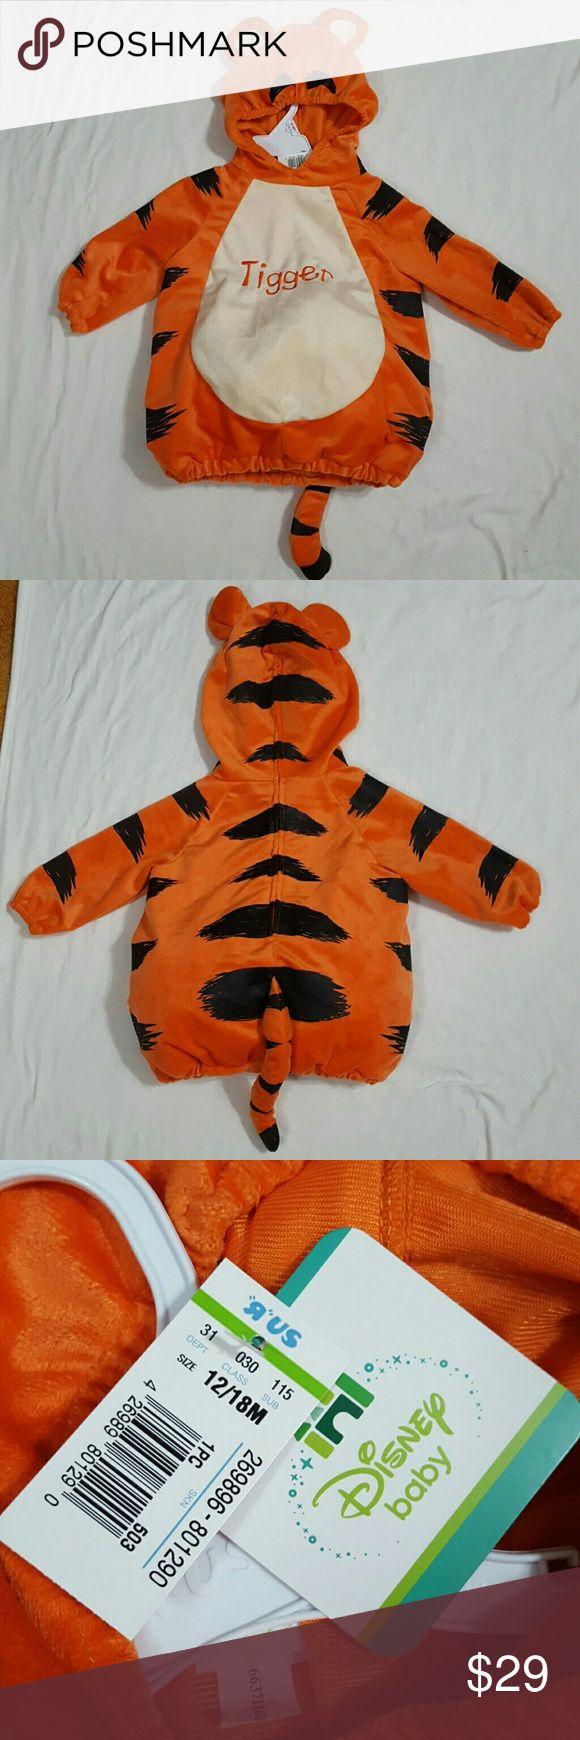 Best 25+ Tigger costume ideas only on Pinterest | Disney costumes ...